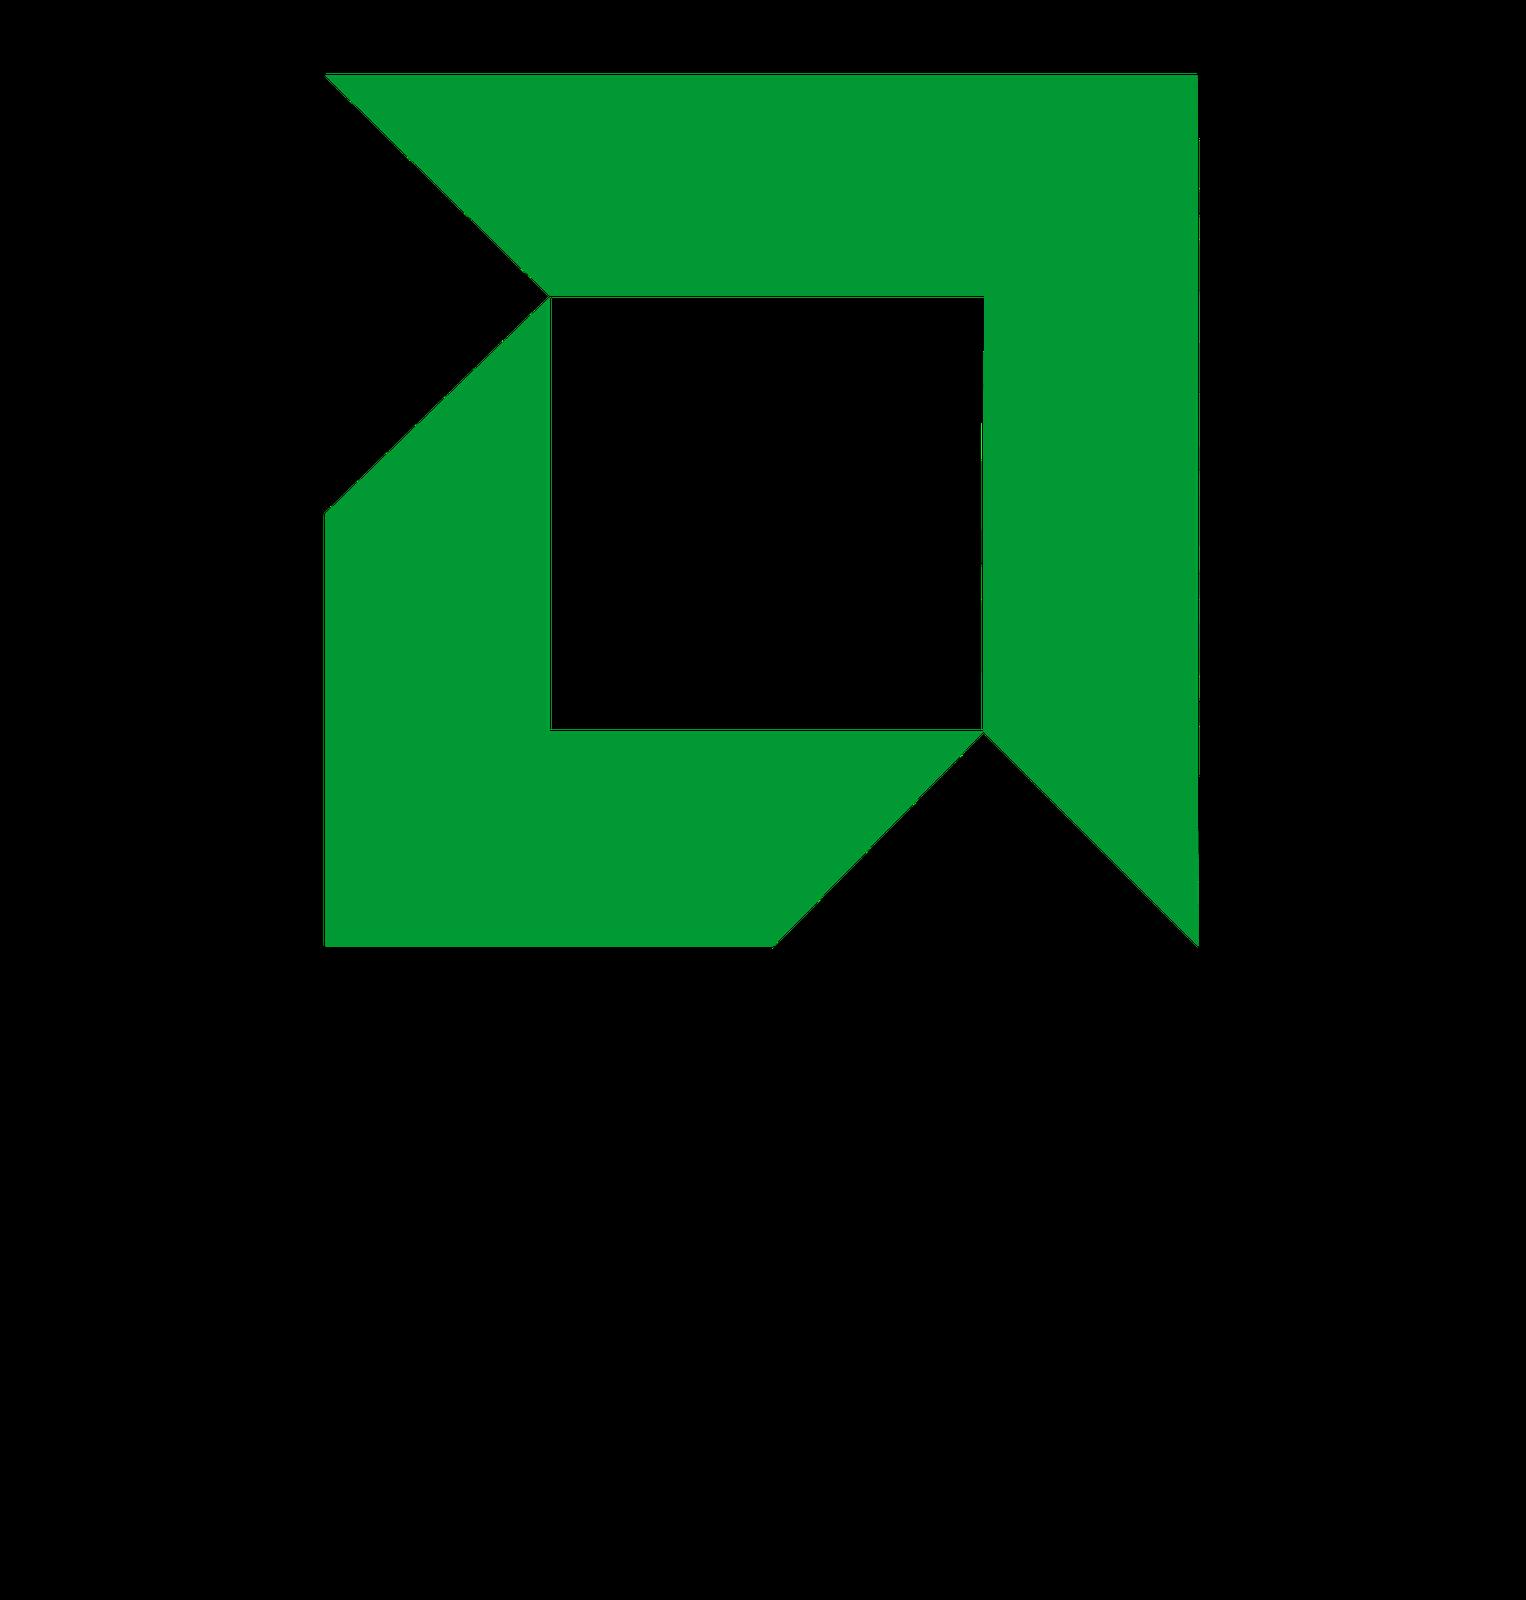 Amd-Square-logo